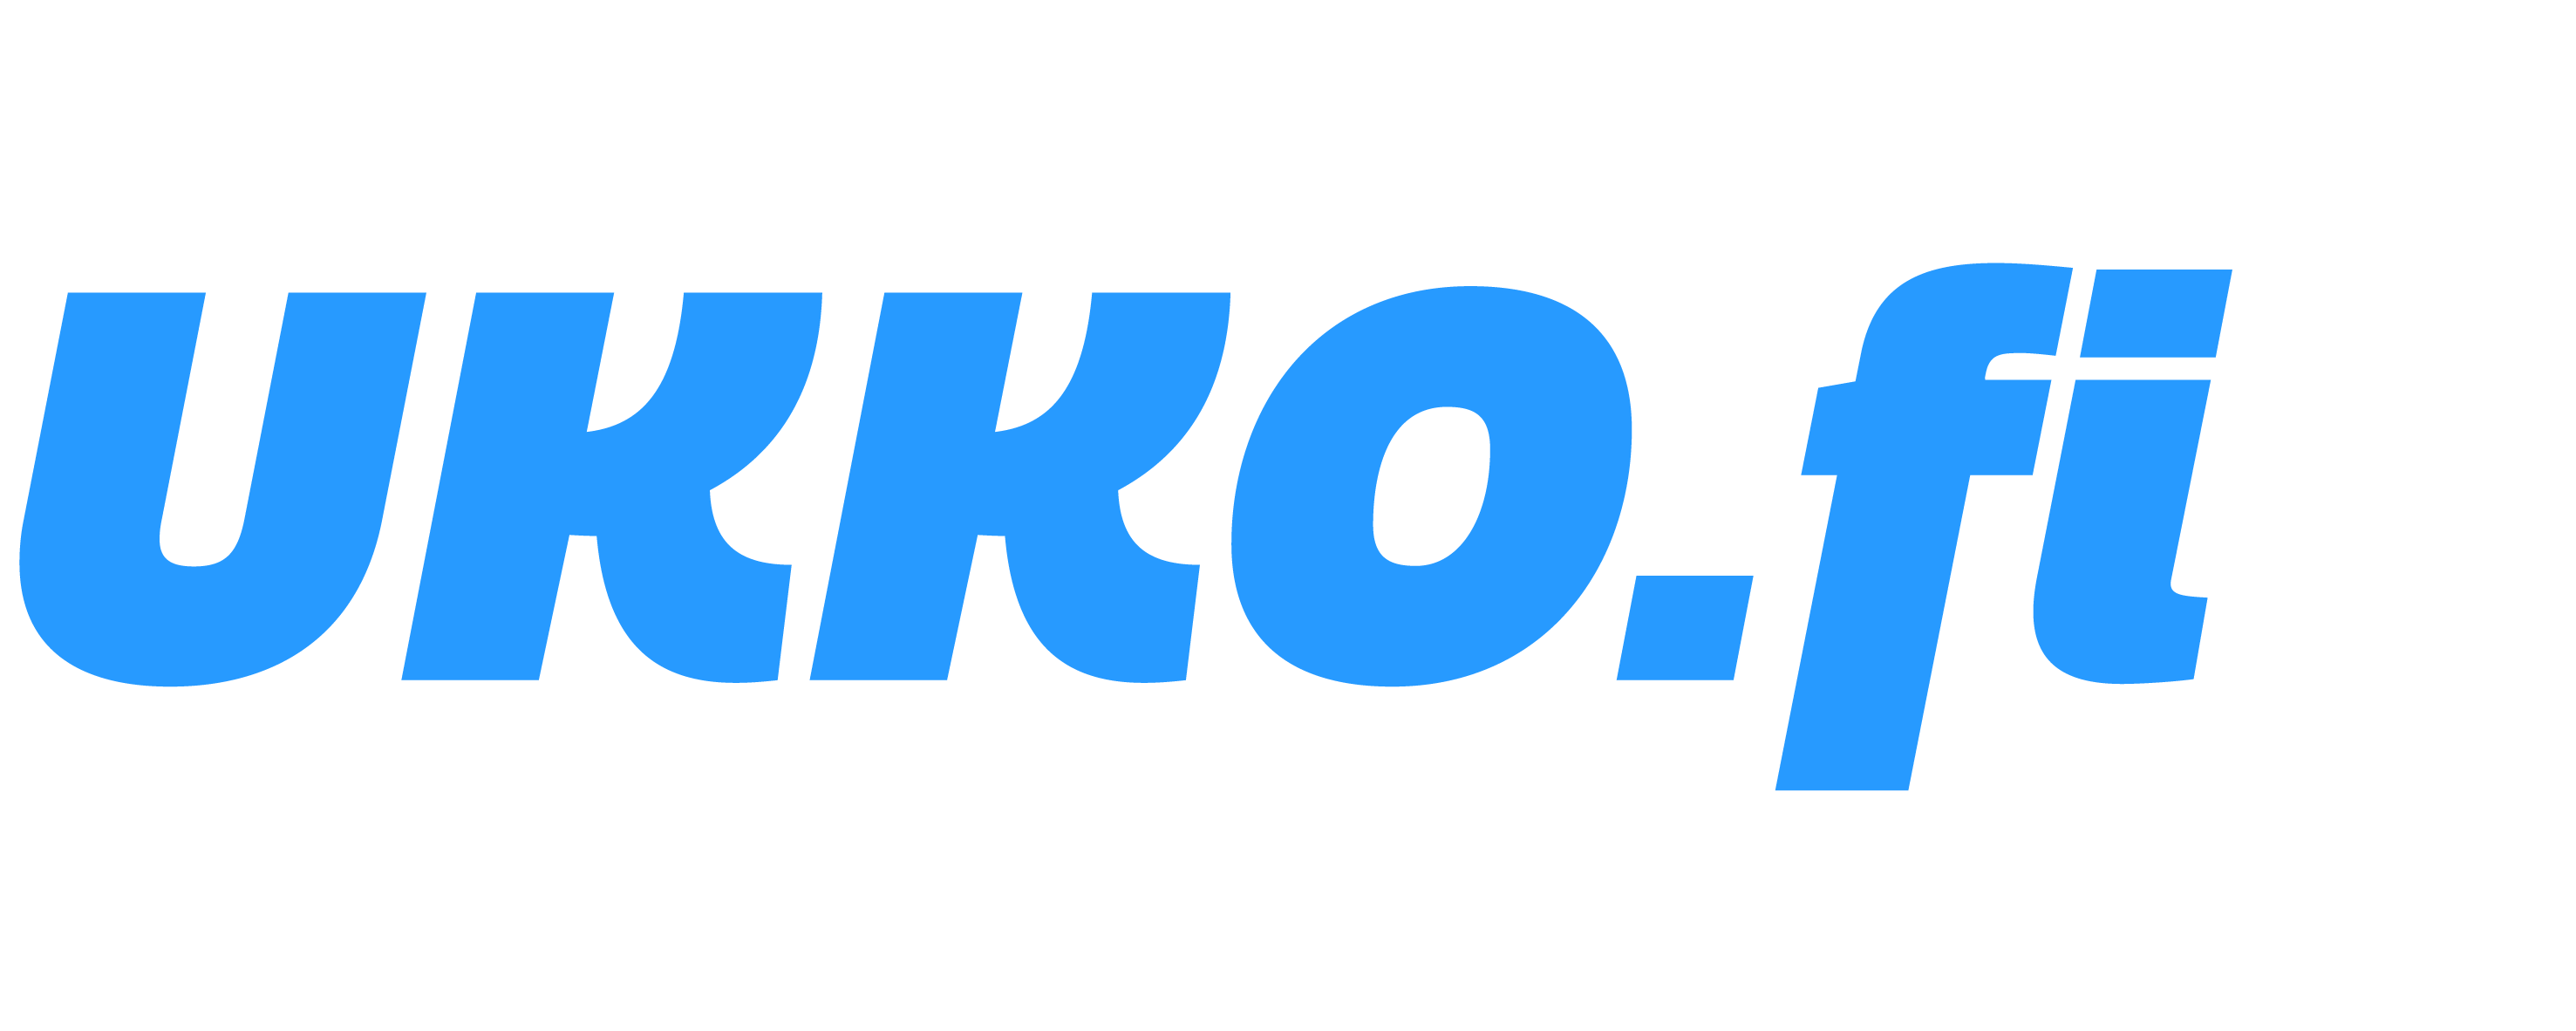 ukko-chatbot-getjenny-30